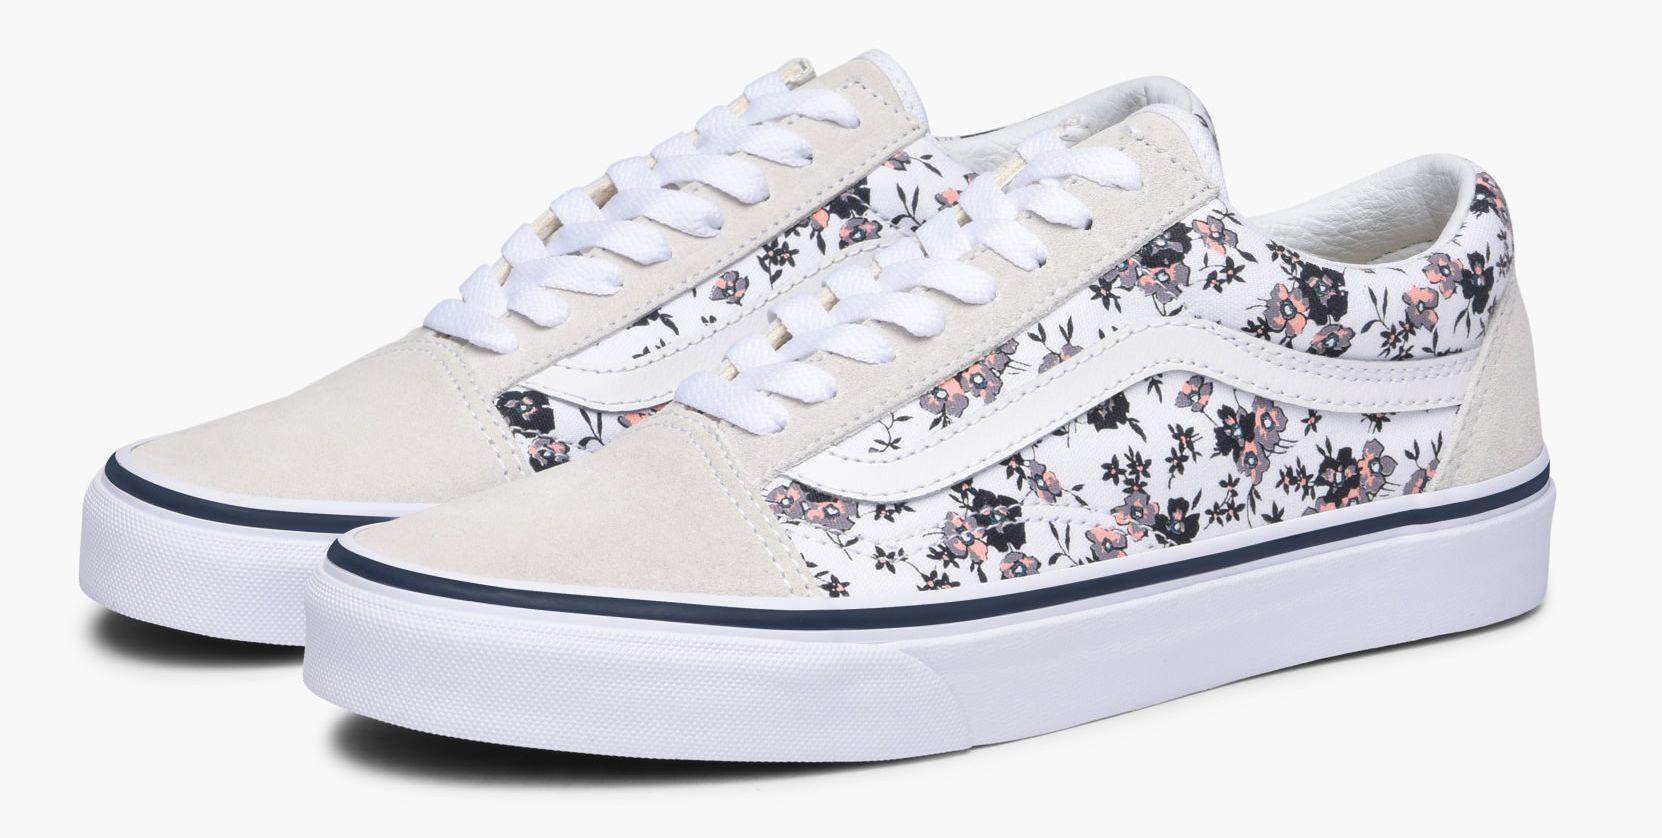 dámske topánky vans OLD SKOOL (DITSY BLOOM) True White dde0f4618a